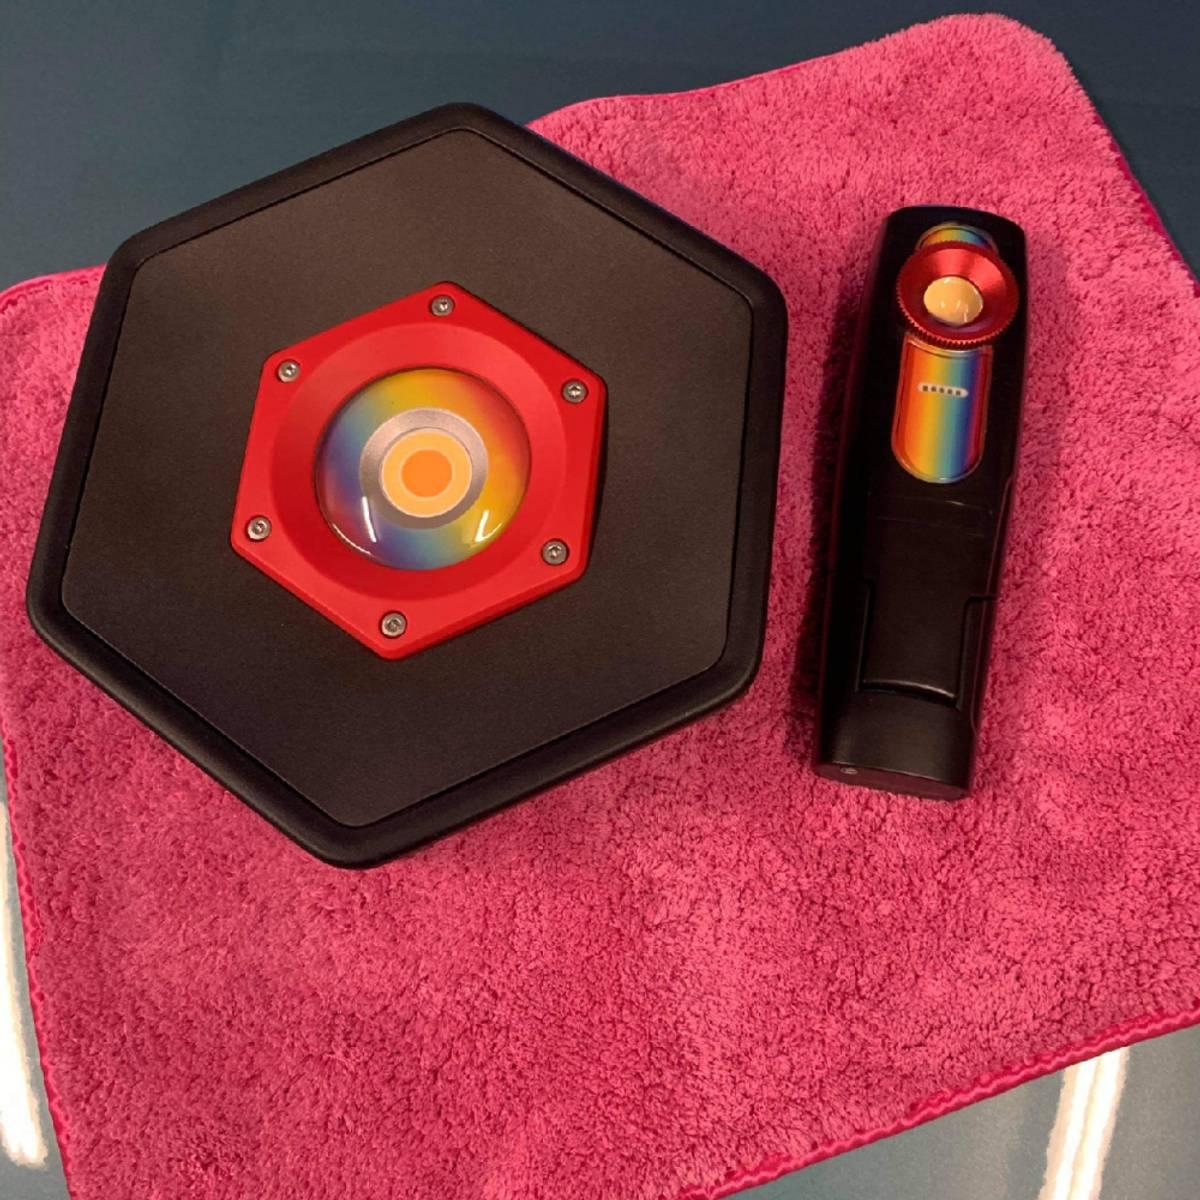 Autochem arbeidslampe Color Match 20W LED